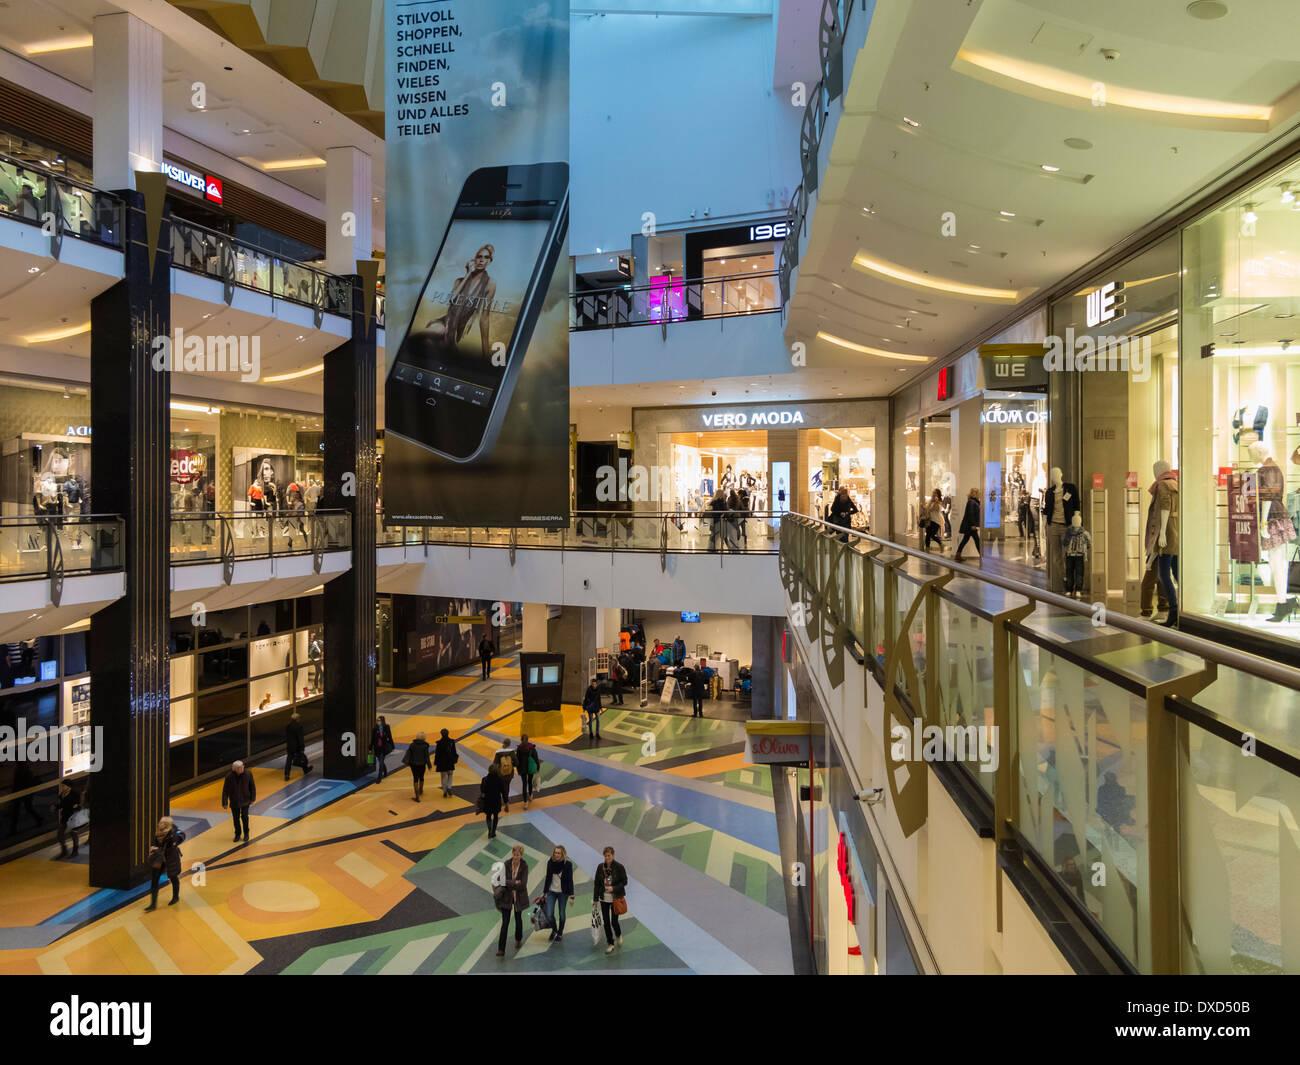 The Alexa Mall, Berlin, Germany, Europe - Stock Image